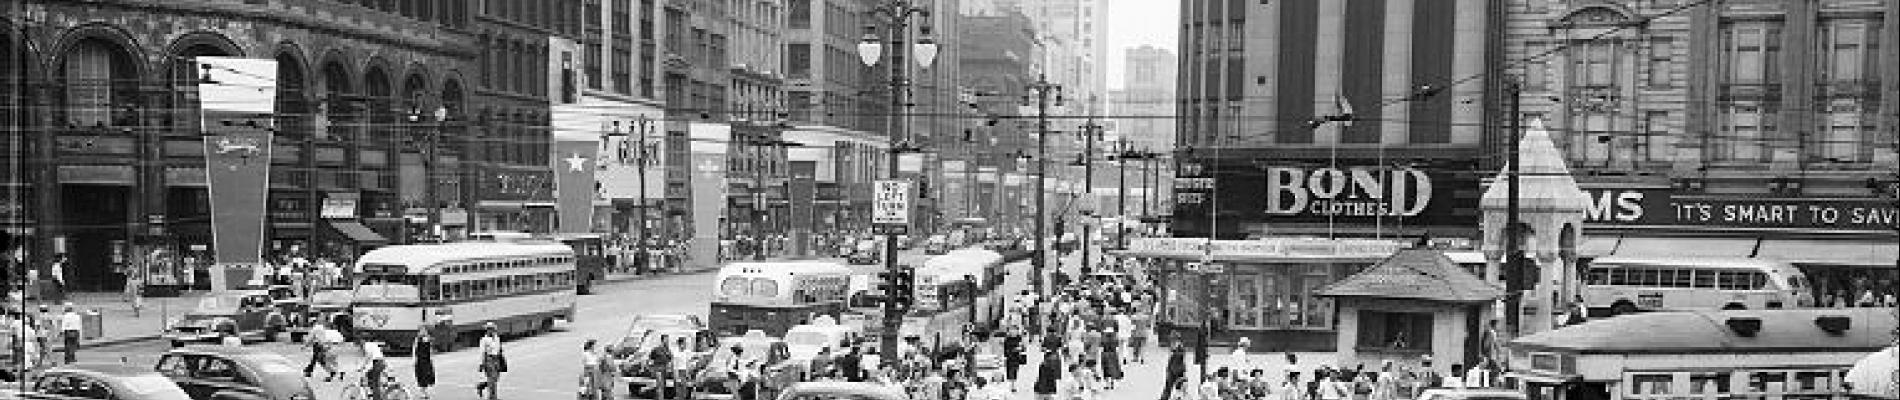 Detroit: Early Detroit History